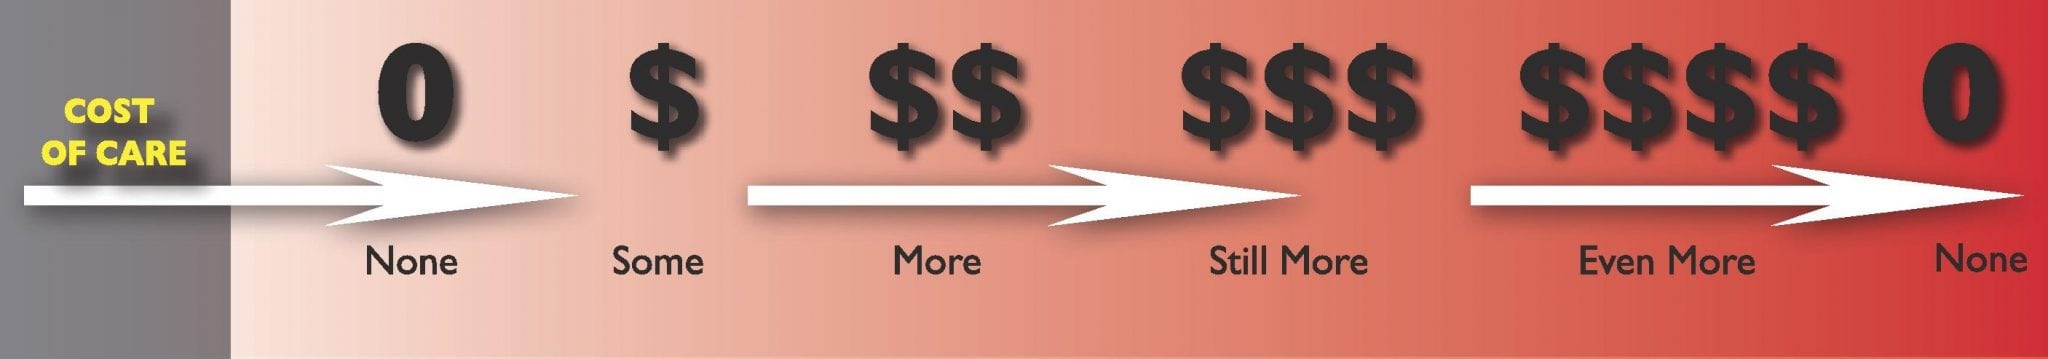 Continuum Cost of Care